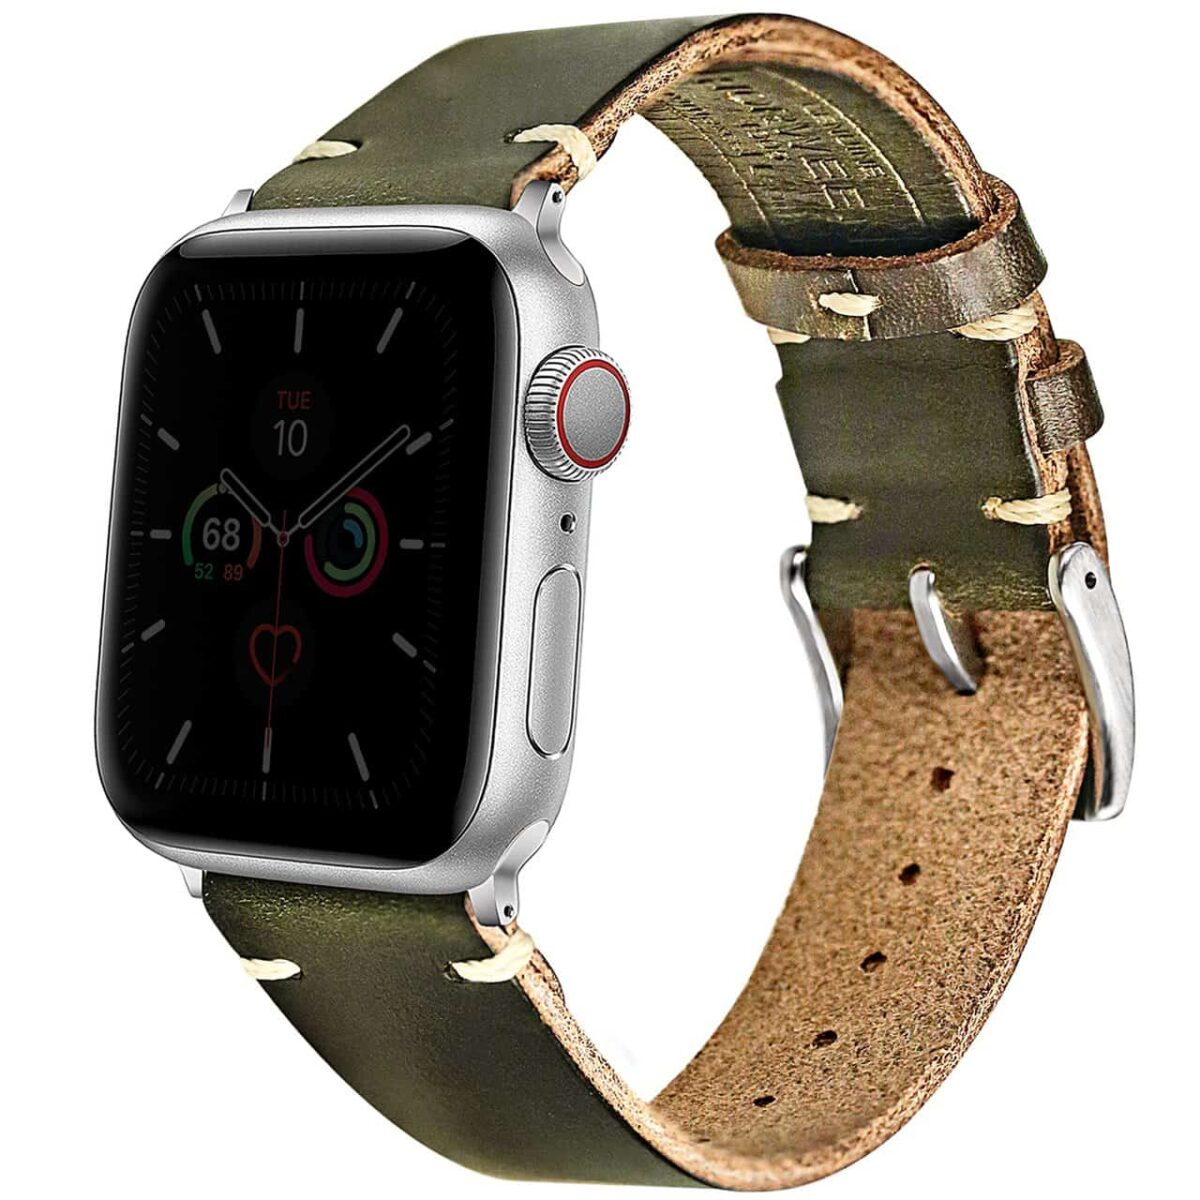 Apple Watch Bands | Green Horween Leather Straps | Hemsut